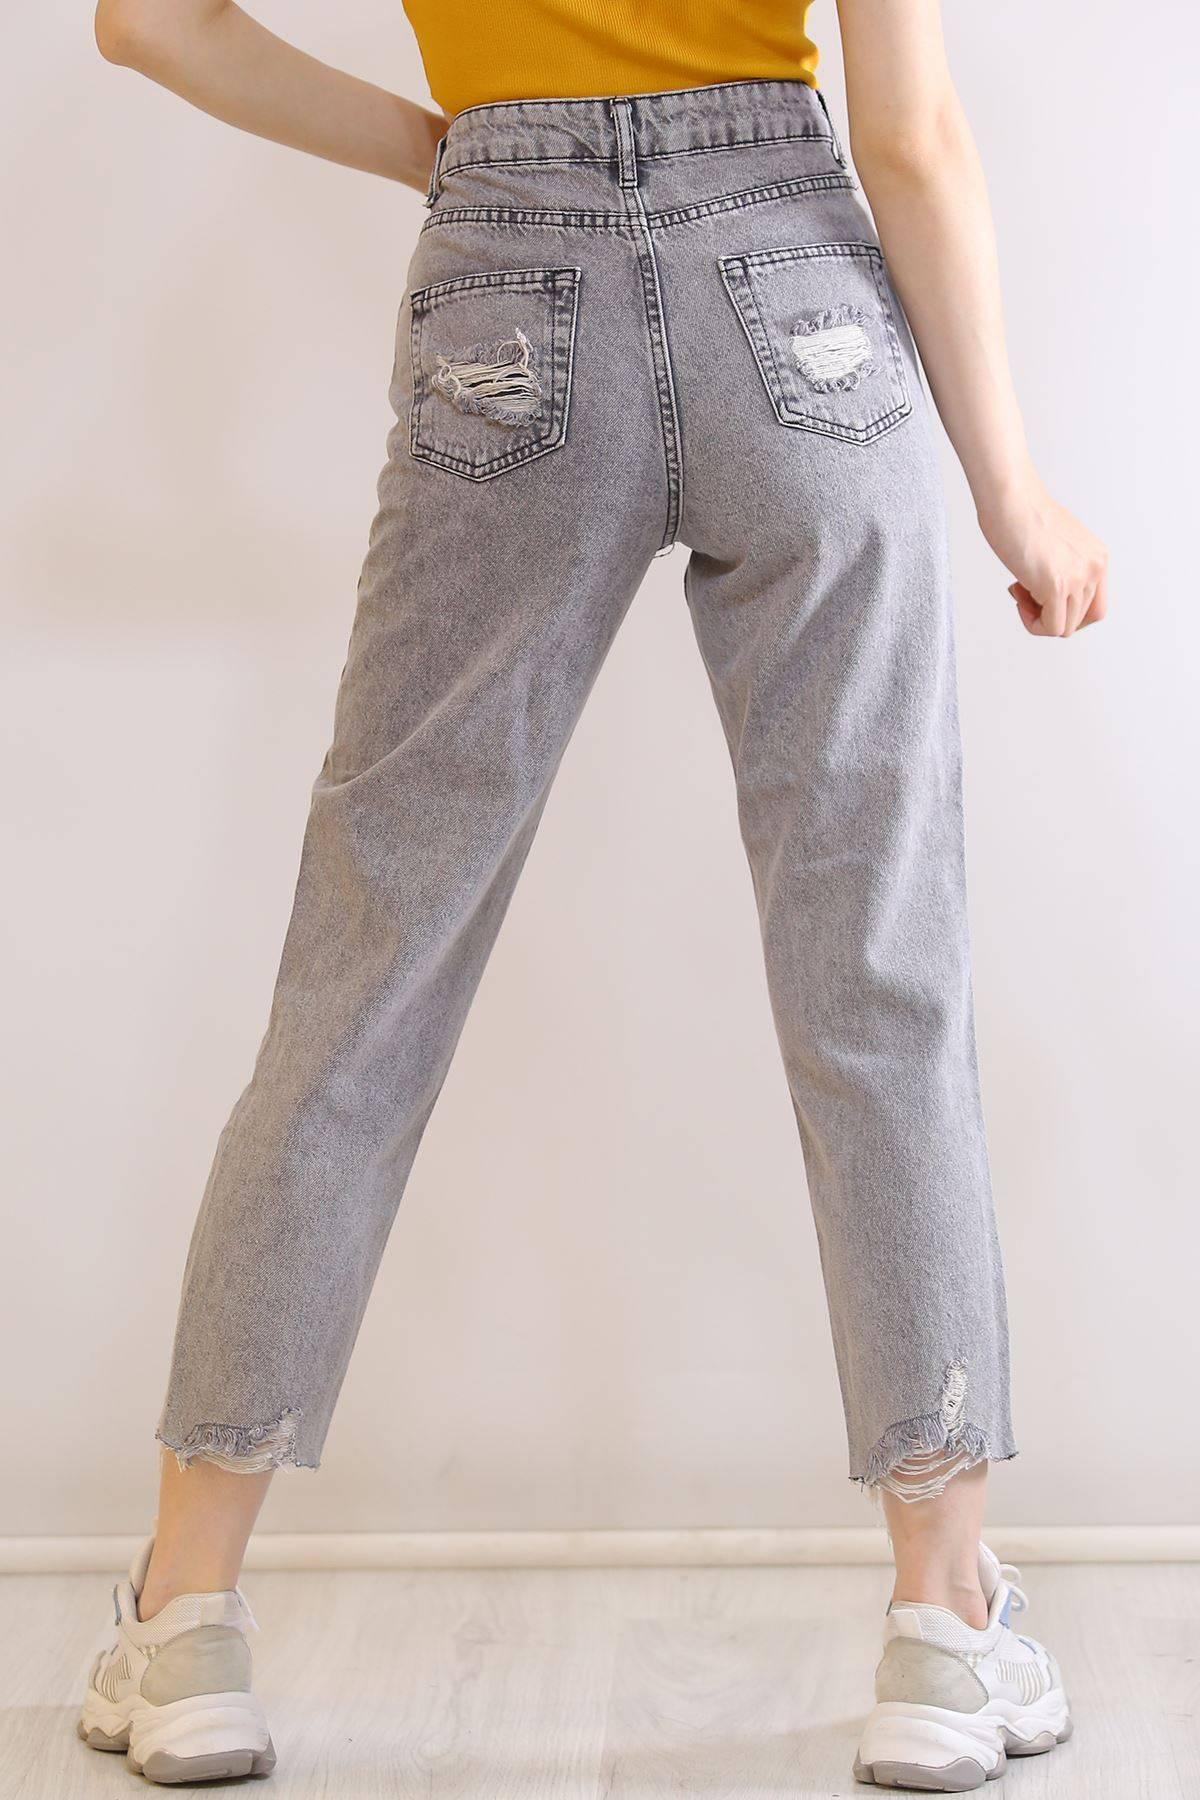 Tek Diz Lazer  Kot Pantolon Füme - 5976.392.